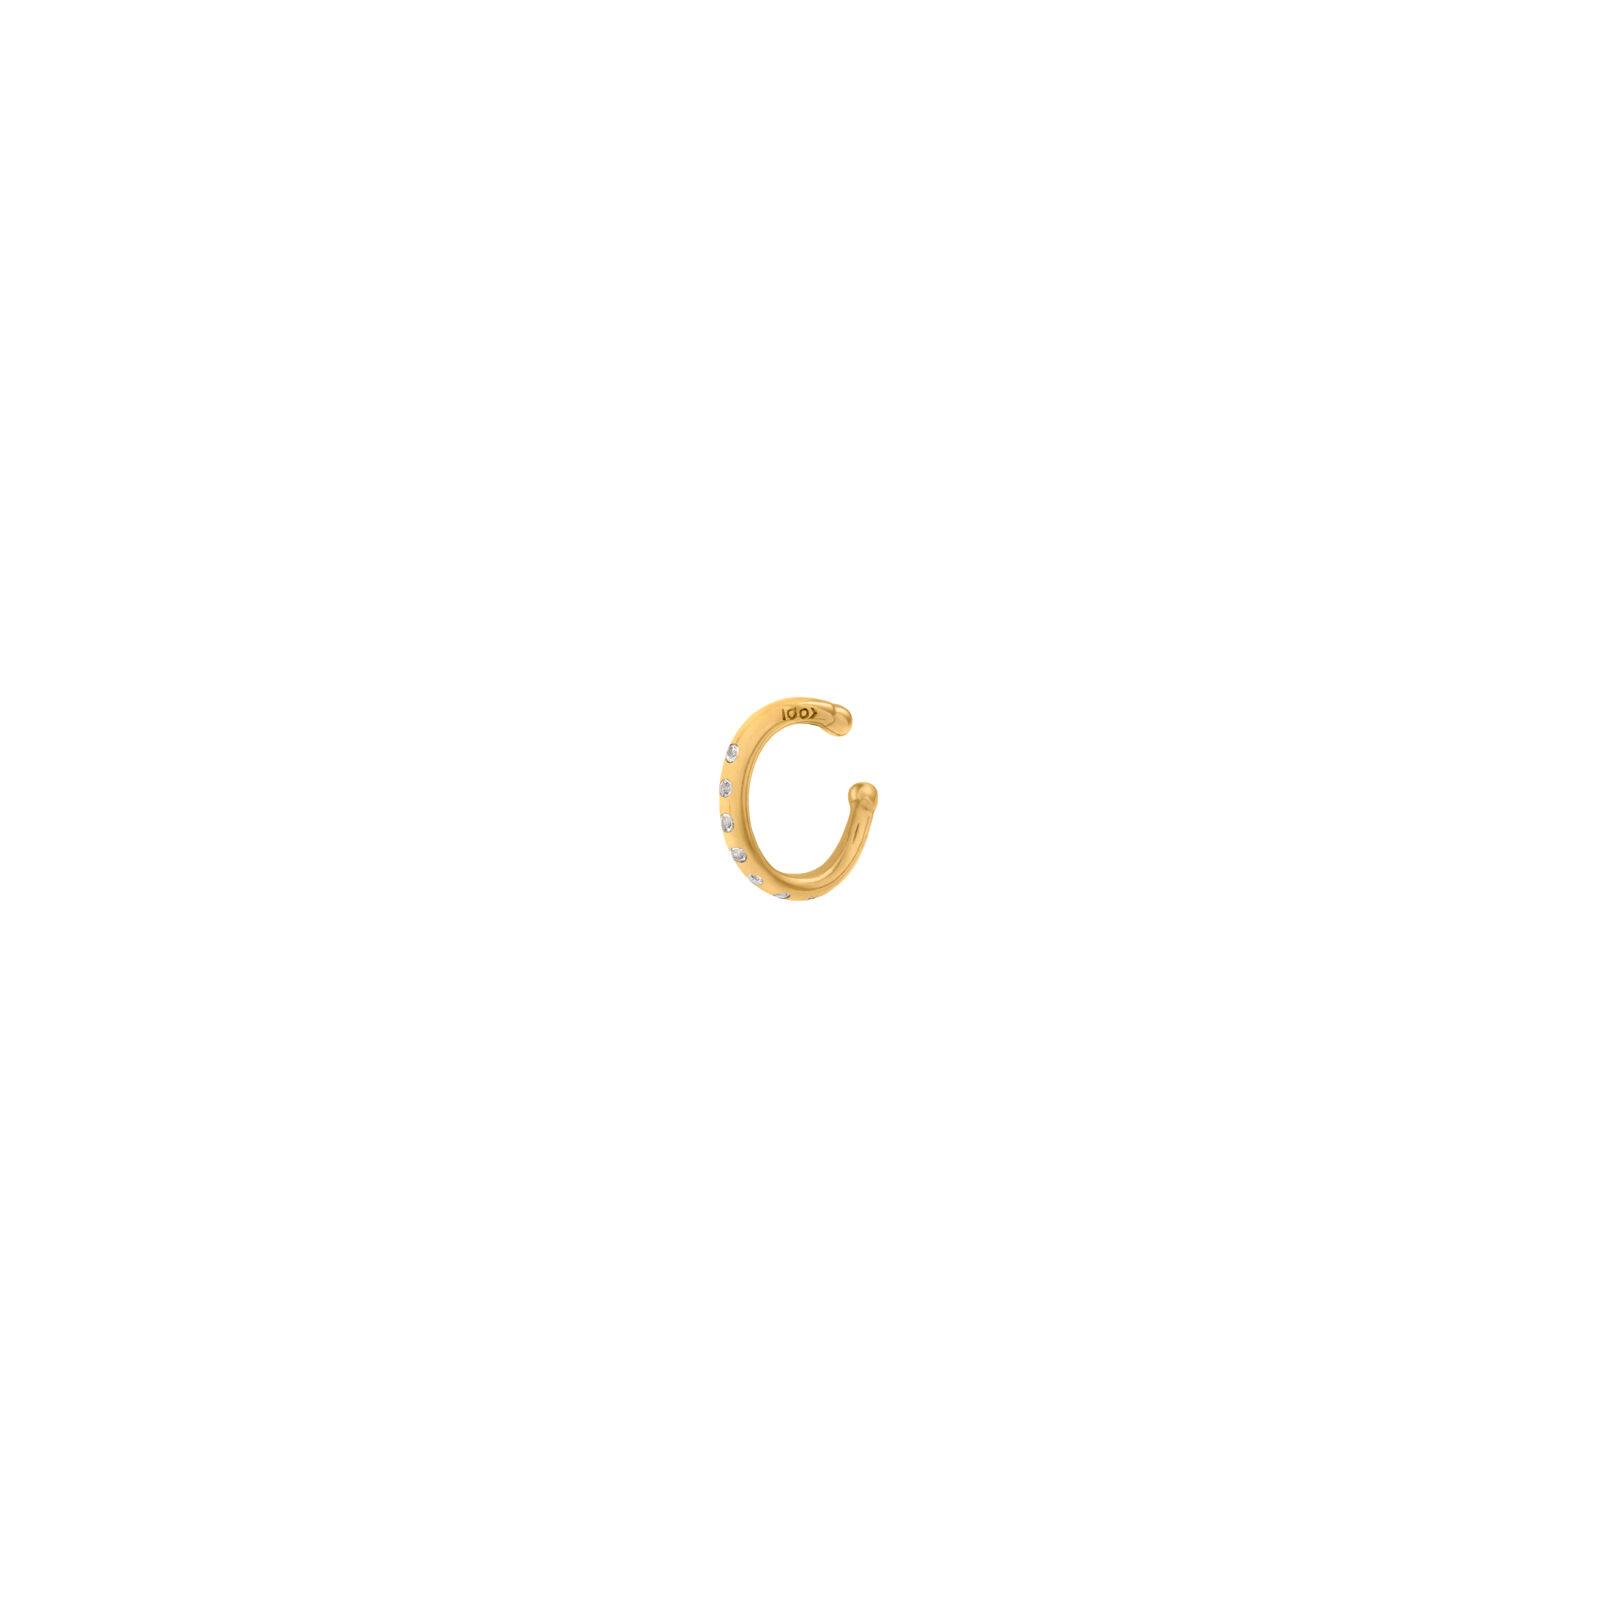 Nausznica Simple Gold Zirconia